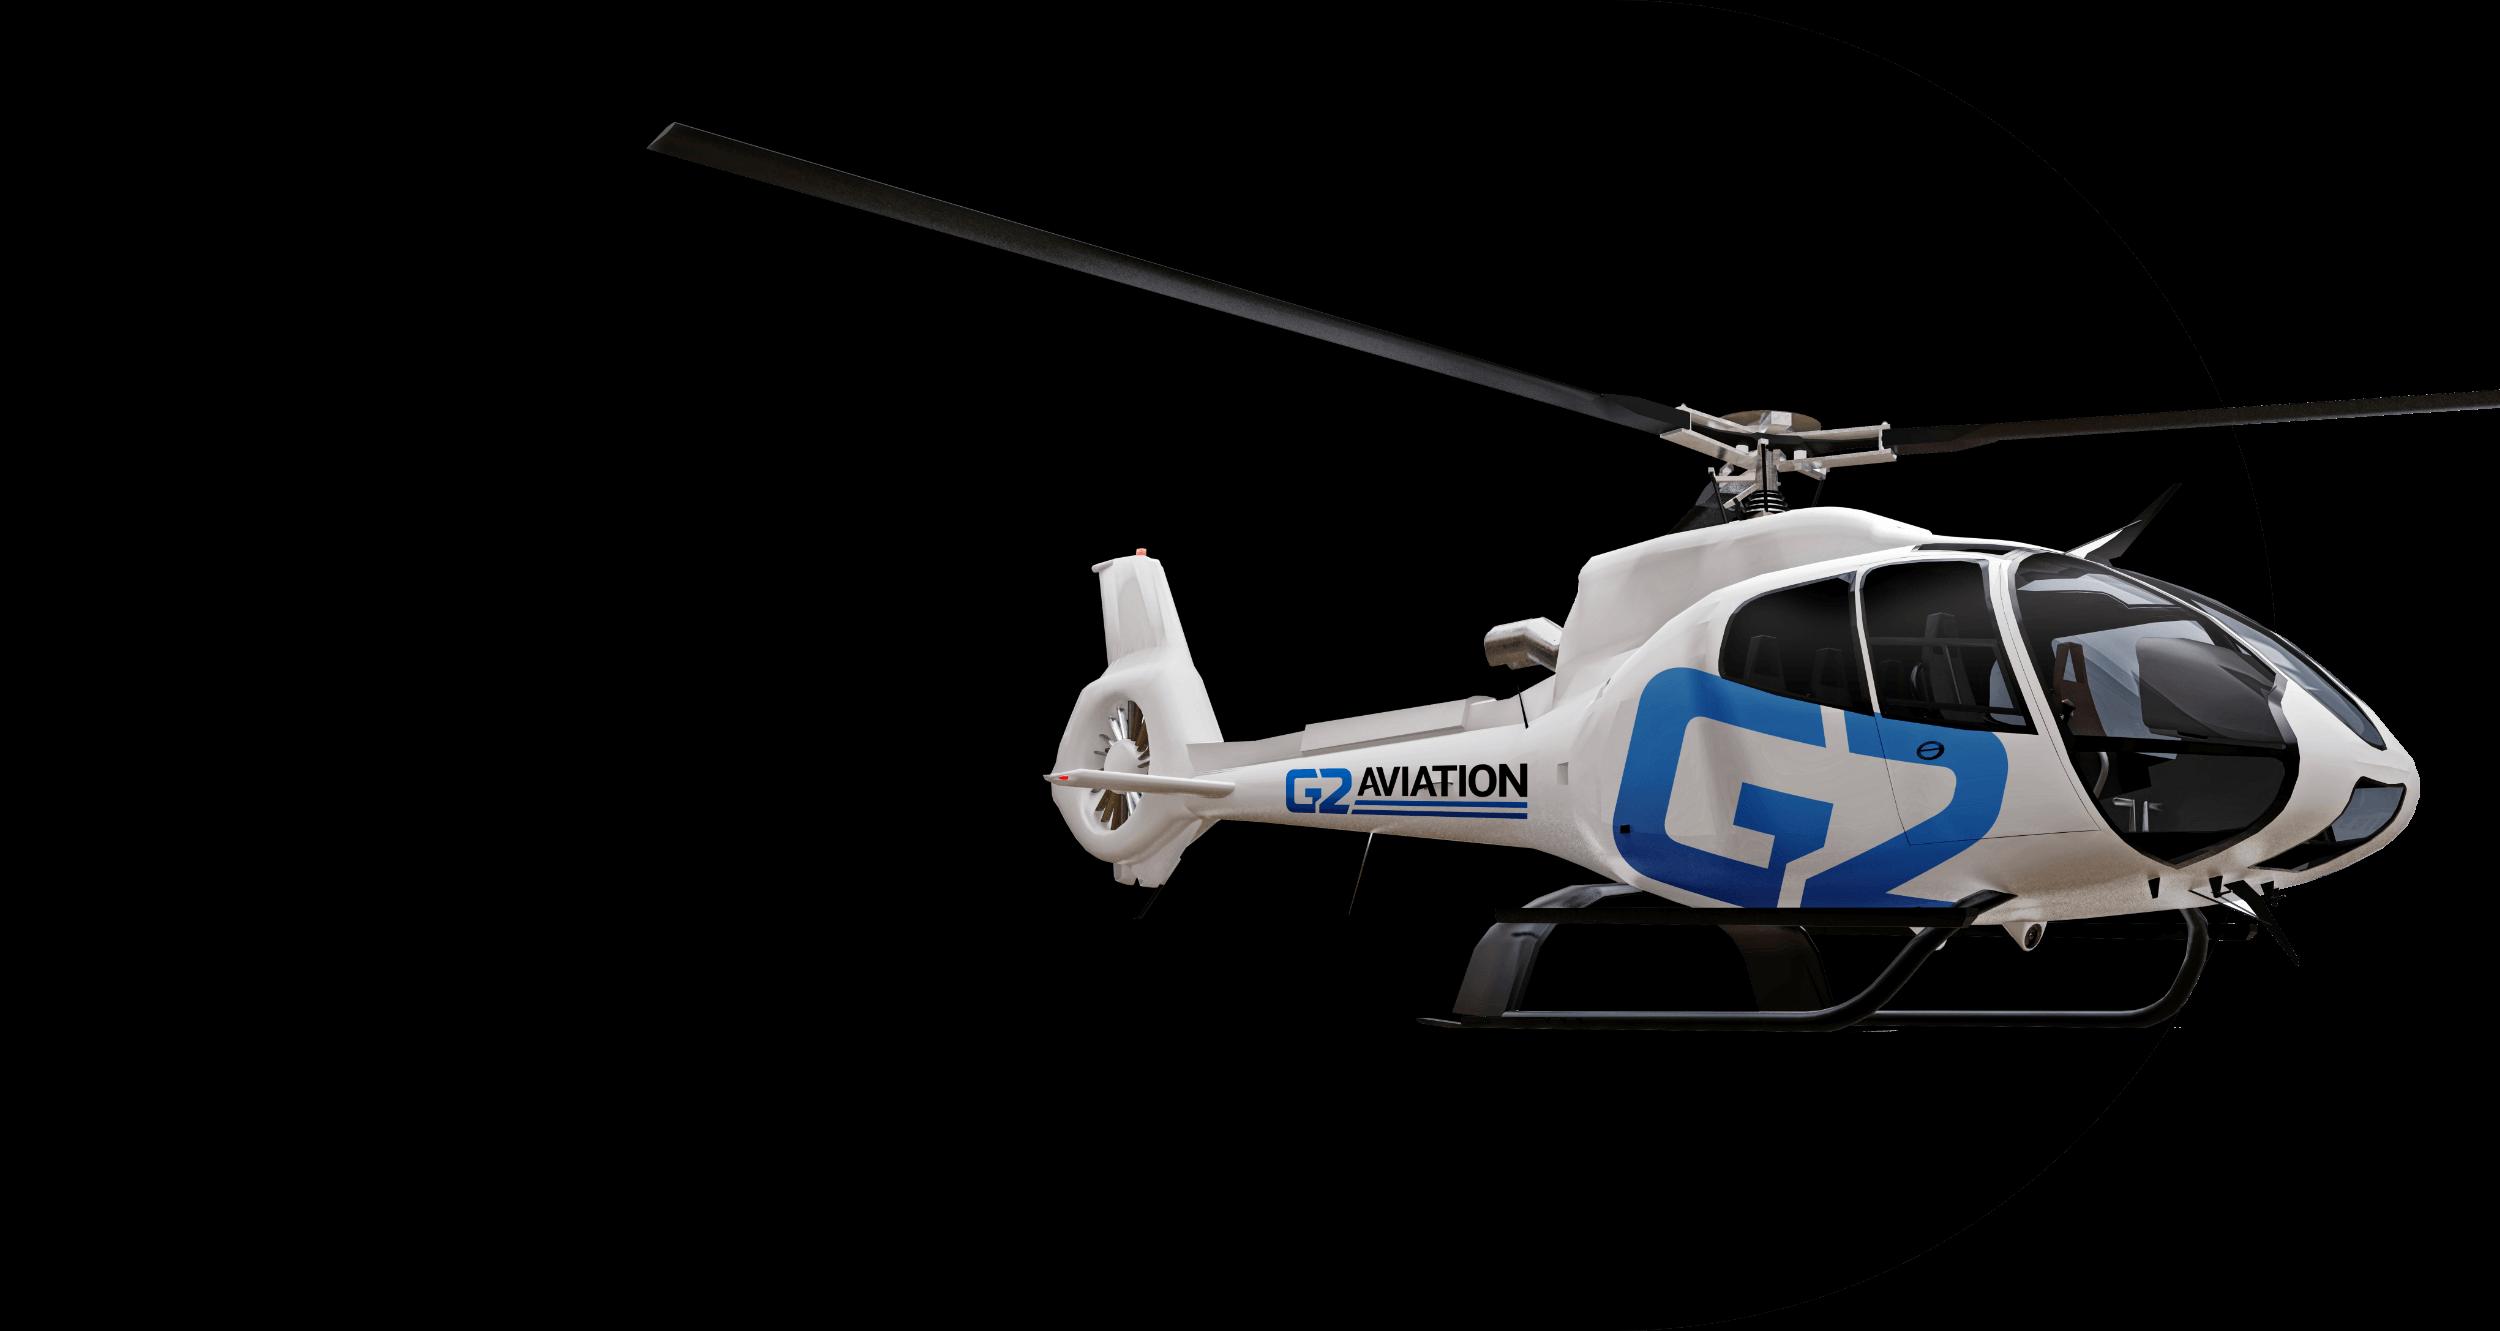 G2 Aviation - Maintenance d'hélicoptères